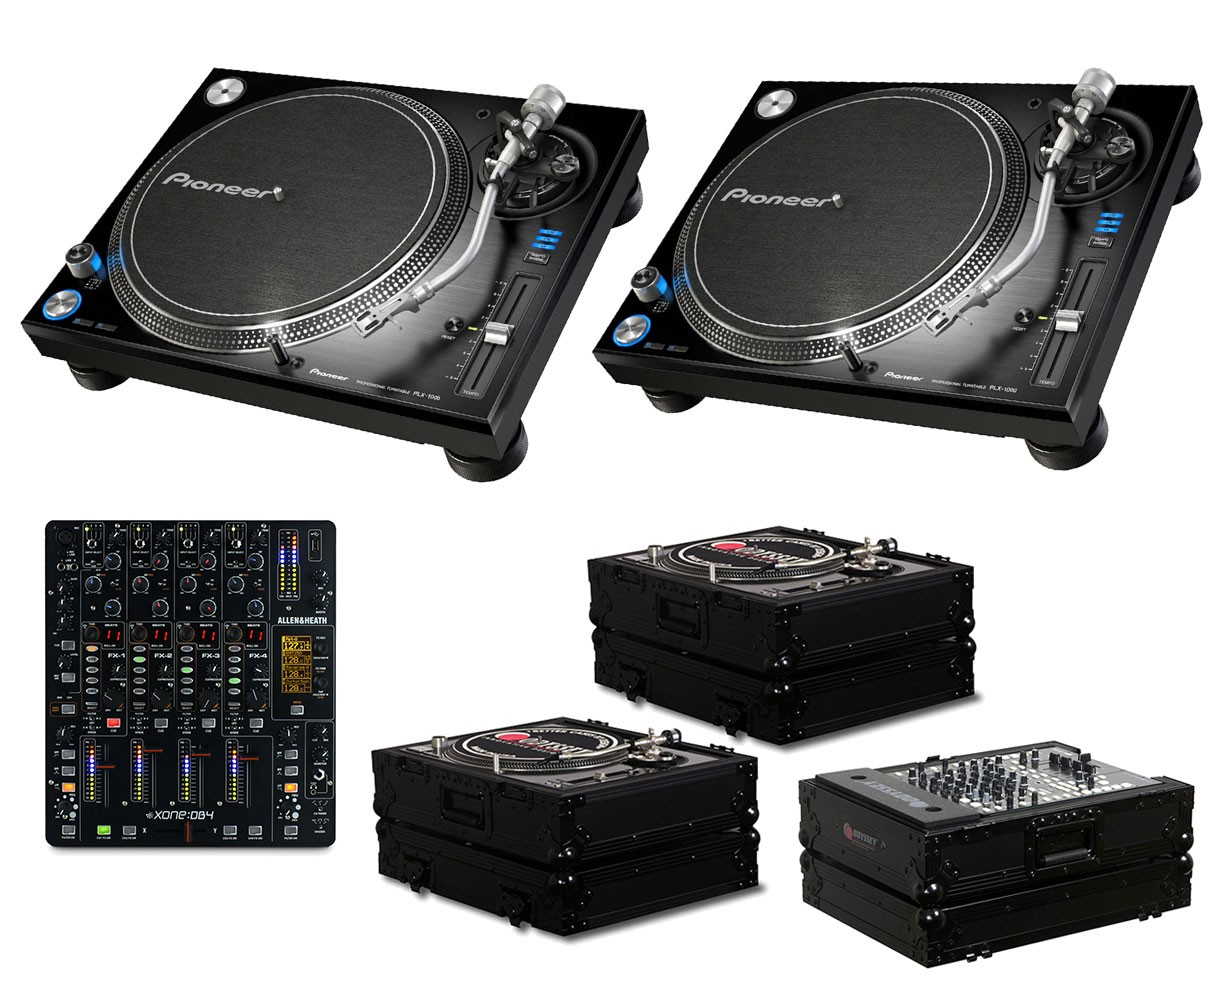 2x Pioneer PLX-1000 + Xone:DB4 + Odyssey Black Label Cases